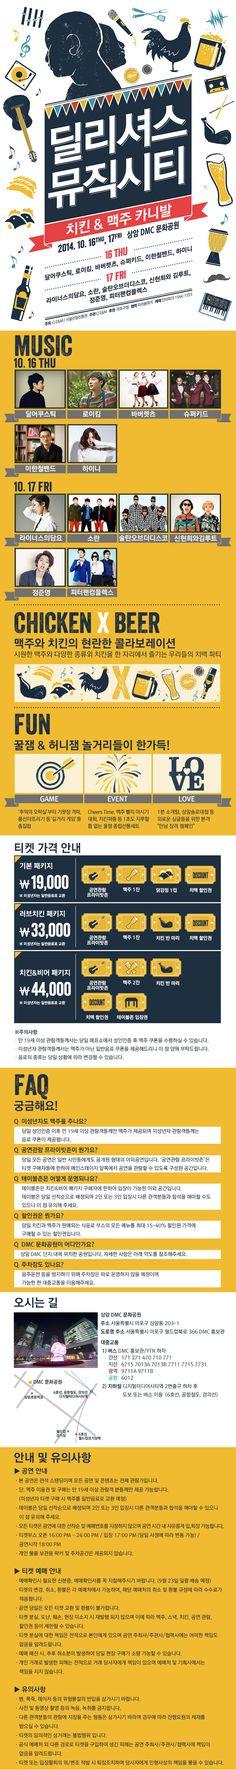 http://ticket.interpark.com/Ticket/Goods/GoodsInfo.asp?GoodsCode=14009378